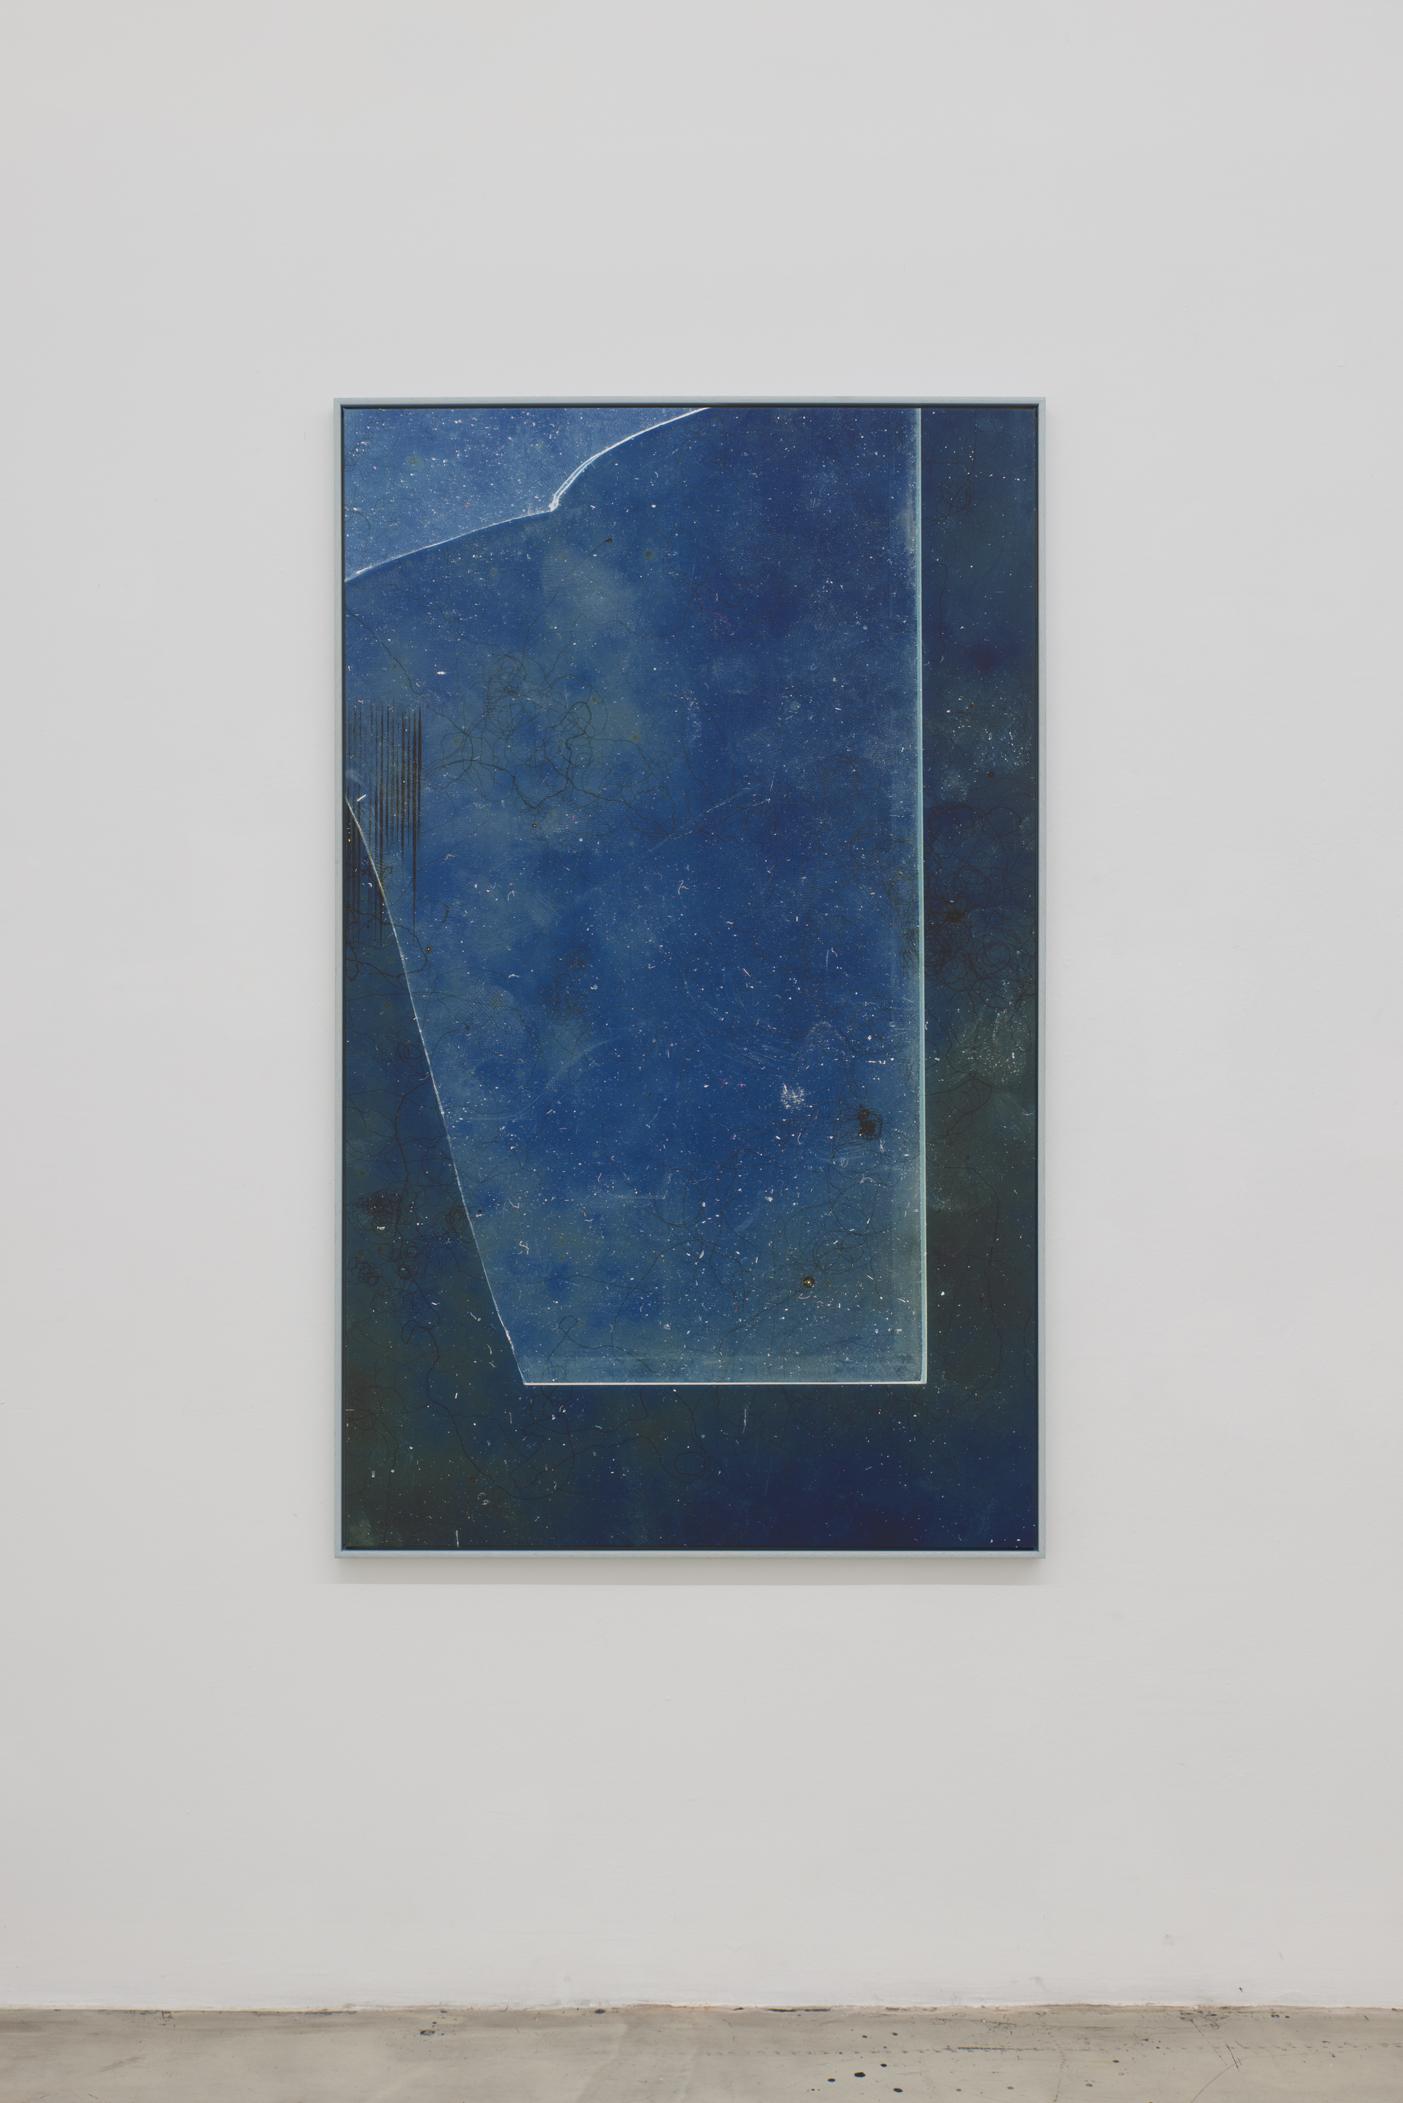 Mladen Bizumic,  ALBUM (Boesner Framing Glass Scan),  Ultrachrome inkjet on canvas,  2018, Courtesy of the artist & Georg Kargl Fine Arts, Vienna